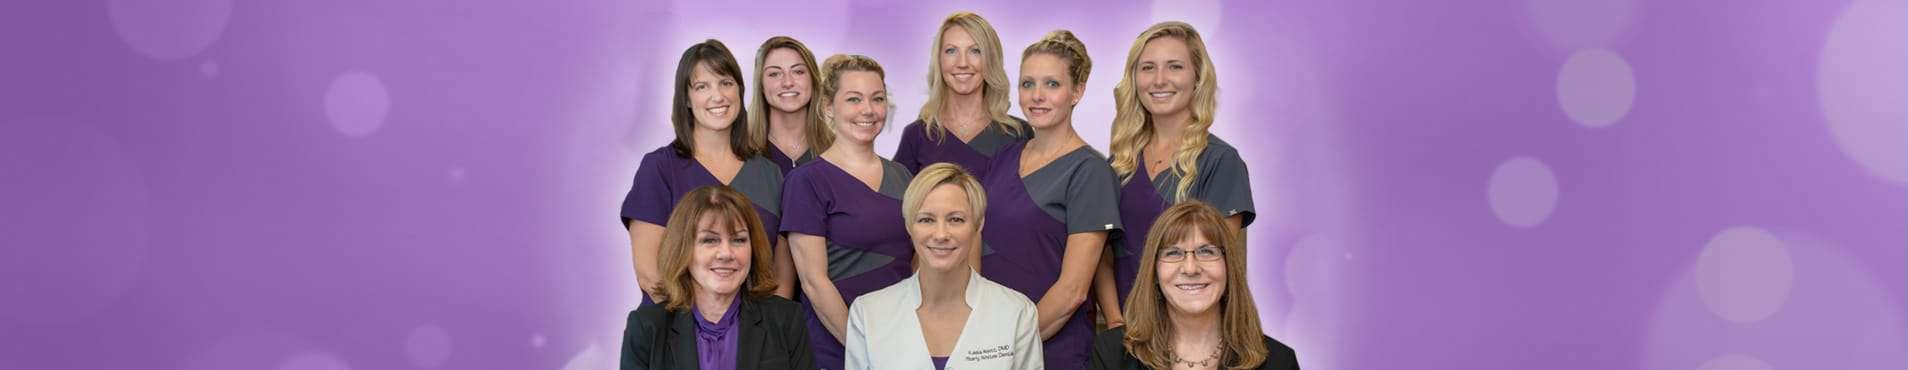 Dental Crowns Dentist Serving Hulmeville